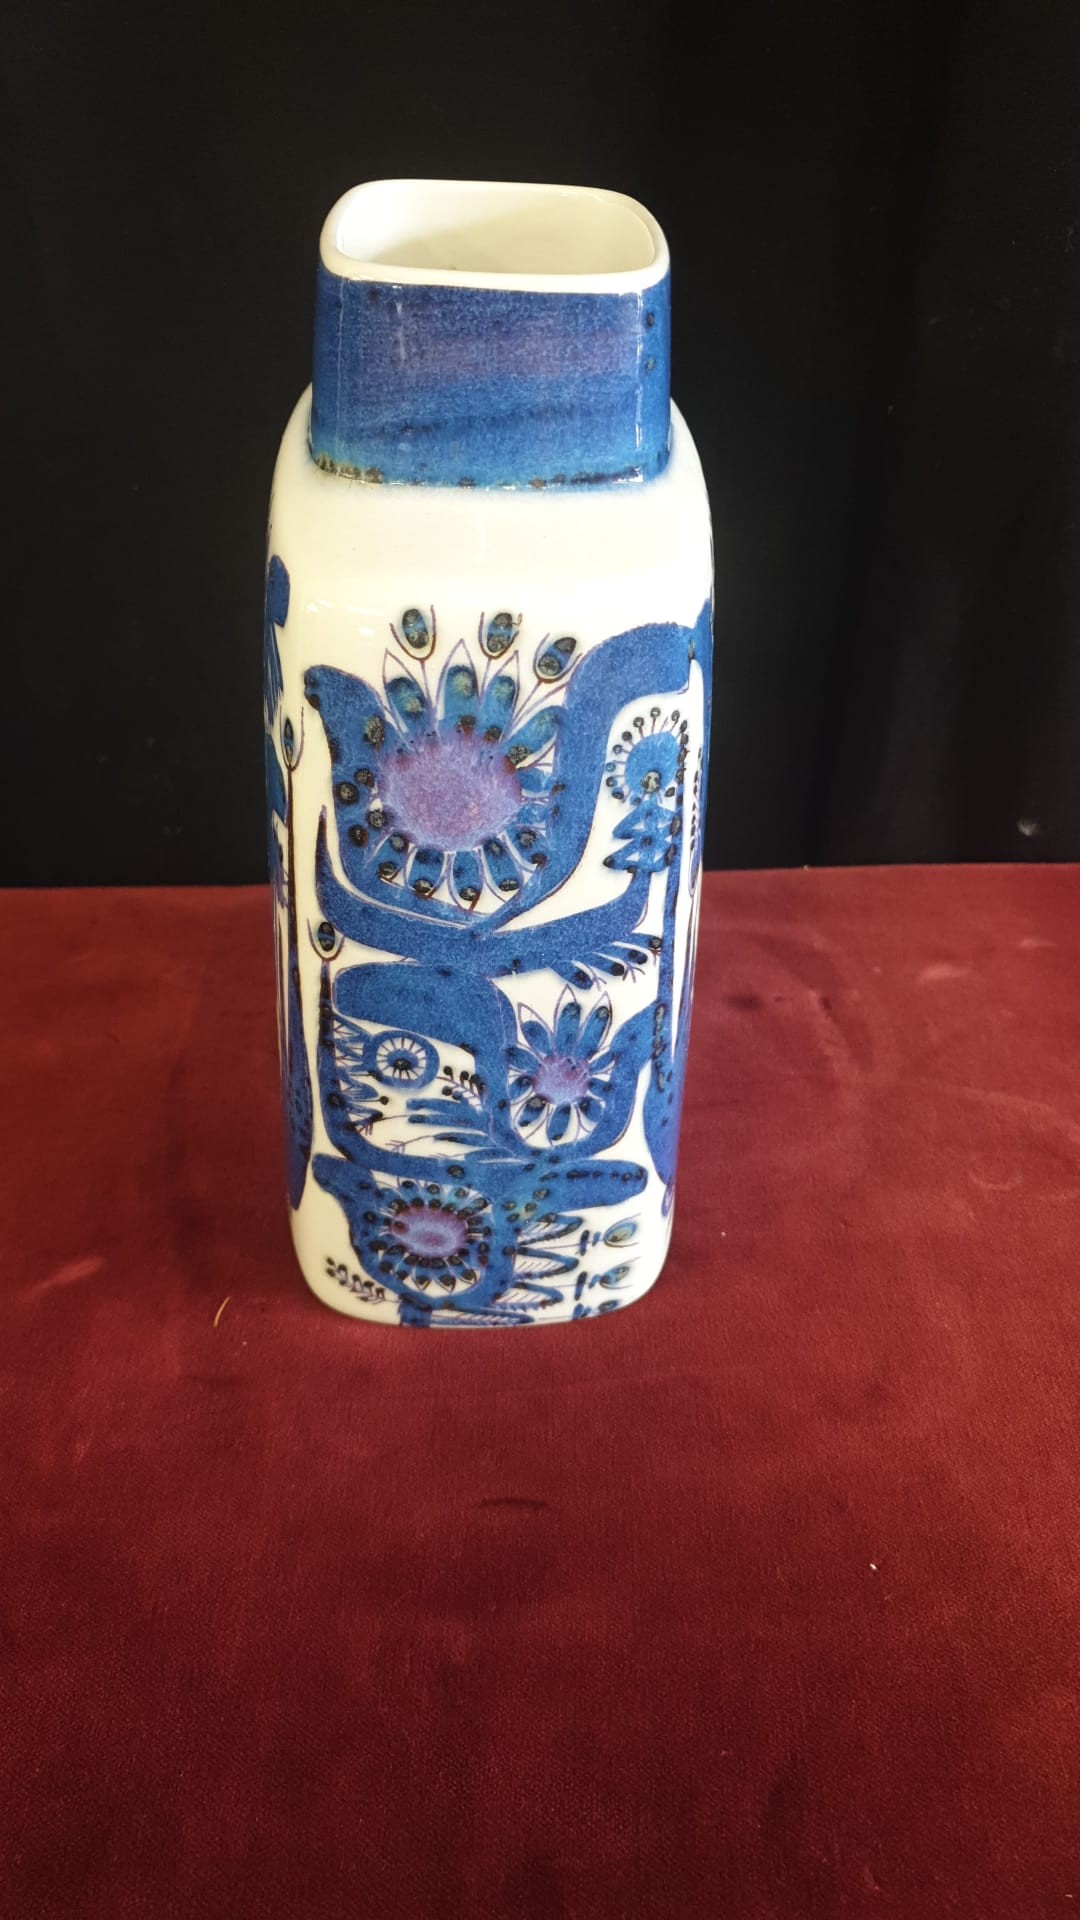 Rare Retro Royal Copenhagen Vase Fajance Pattern Signed By Artist 19 cm Tall Very Good Condition - Image 3 of 4